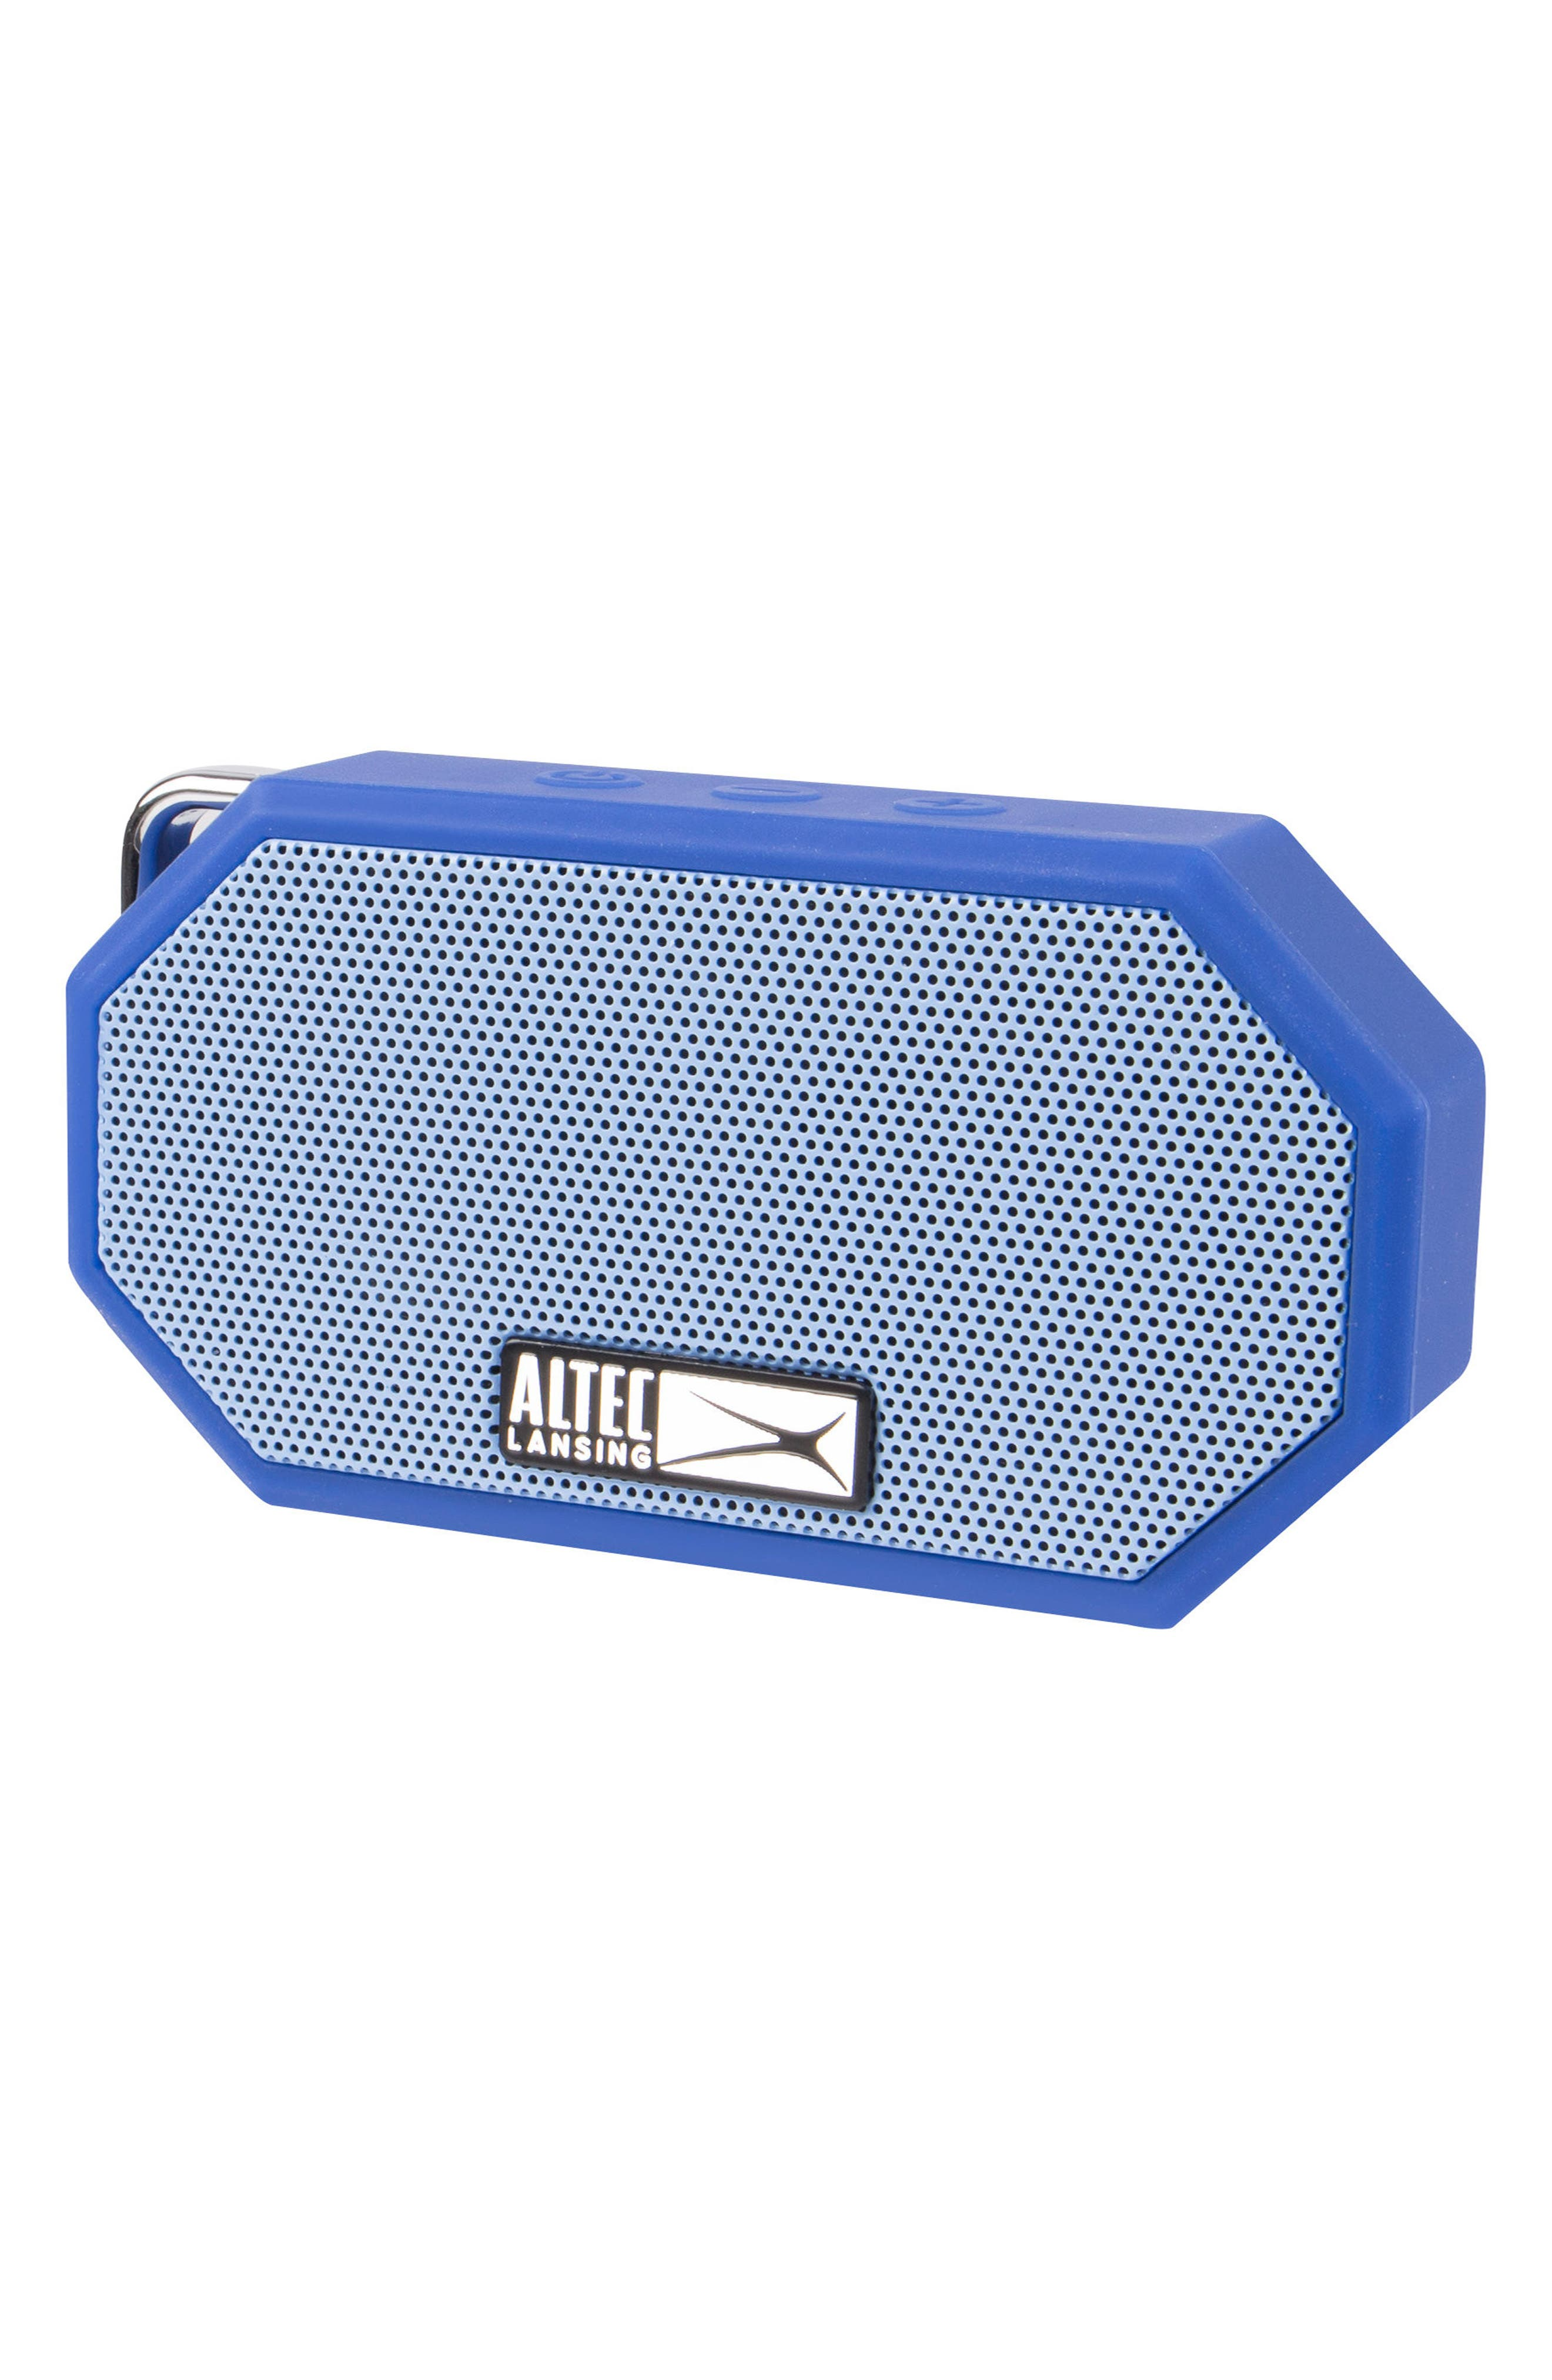 Altec Lansing Mini H2O 3 Waterproof Compact Speaker